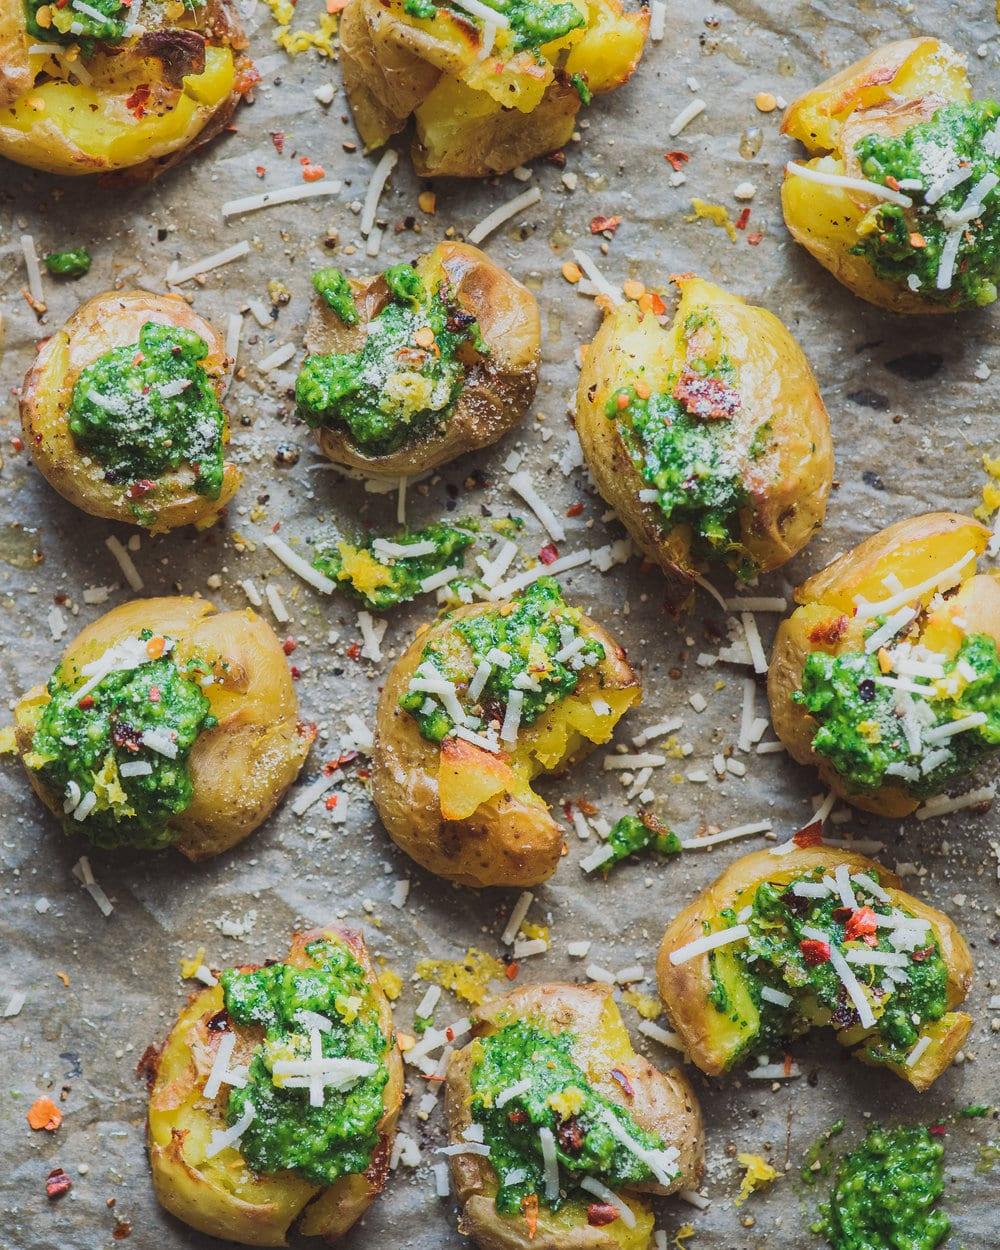 Crispy Smashed Potatoes with Cilantro Pesto